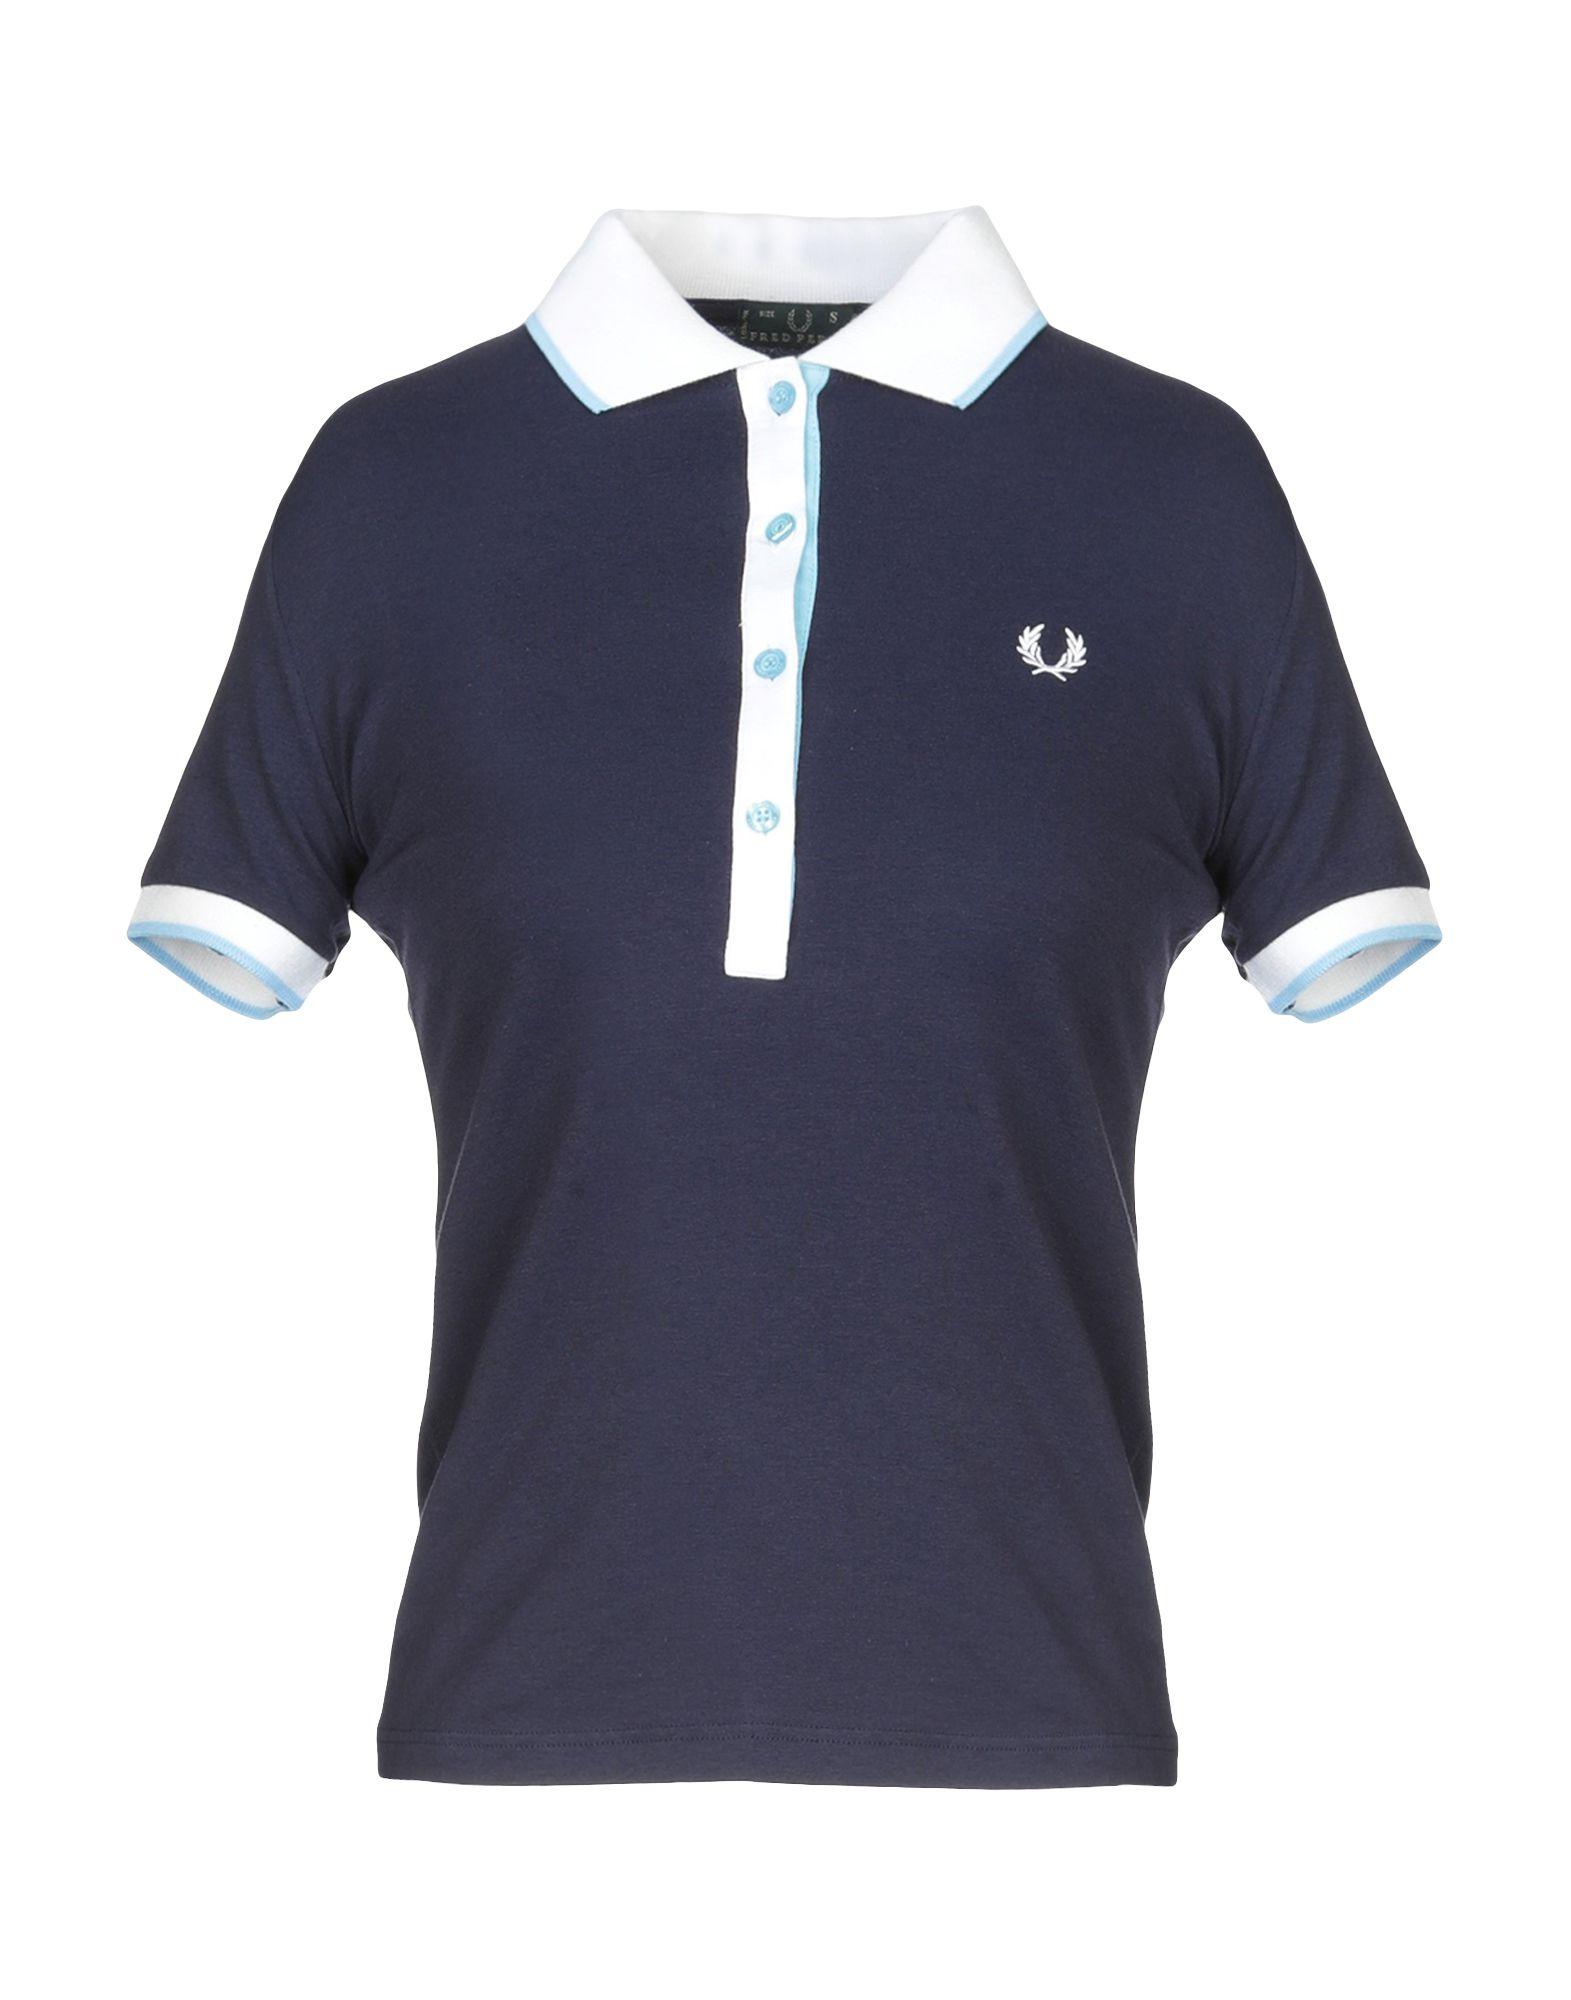 a5d101c53308a1 《セール開催中》FRED PERRY レディース ポロシャツ ダークブルー S コットン 95% / ポリウレタン 5%